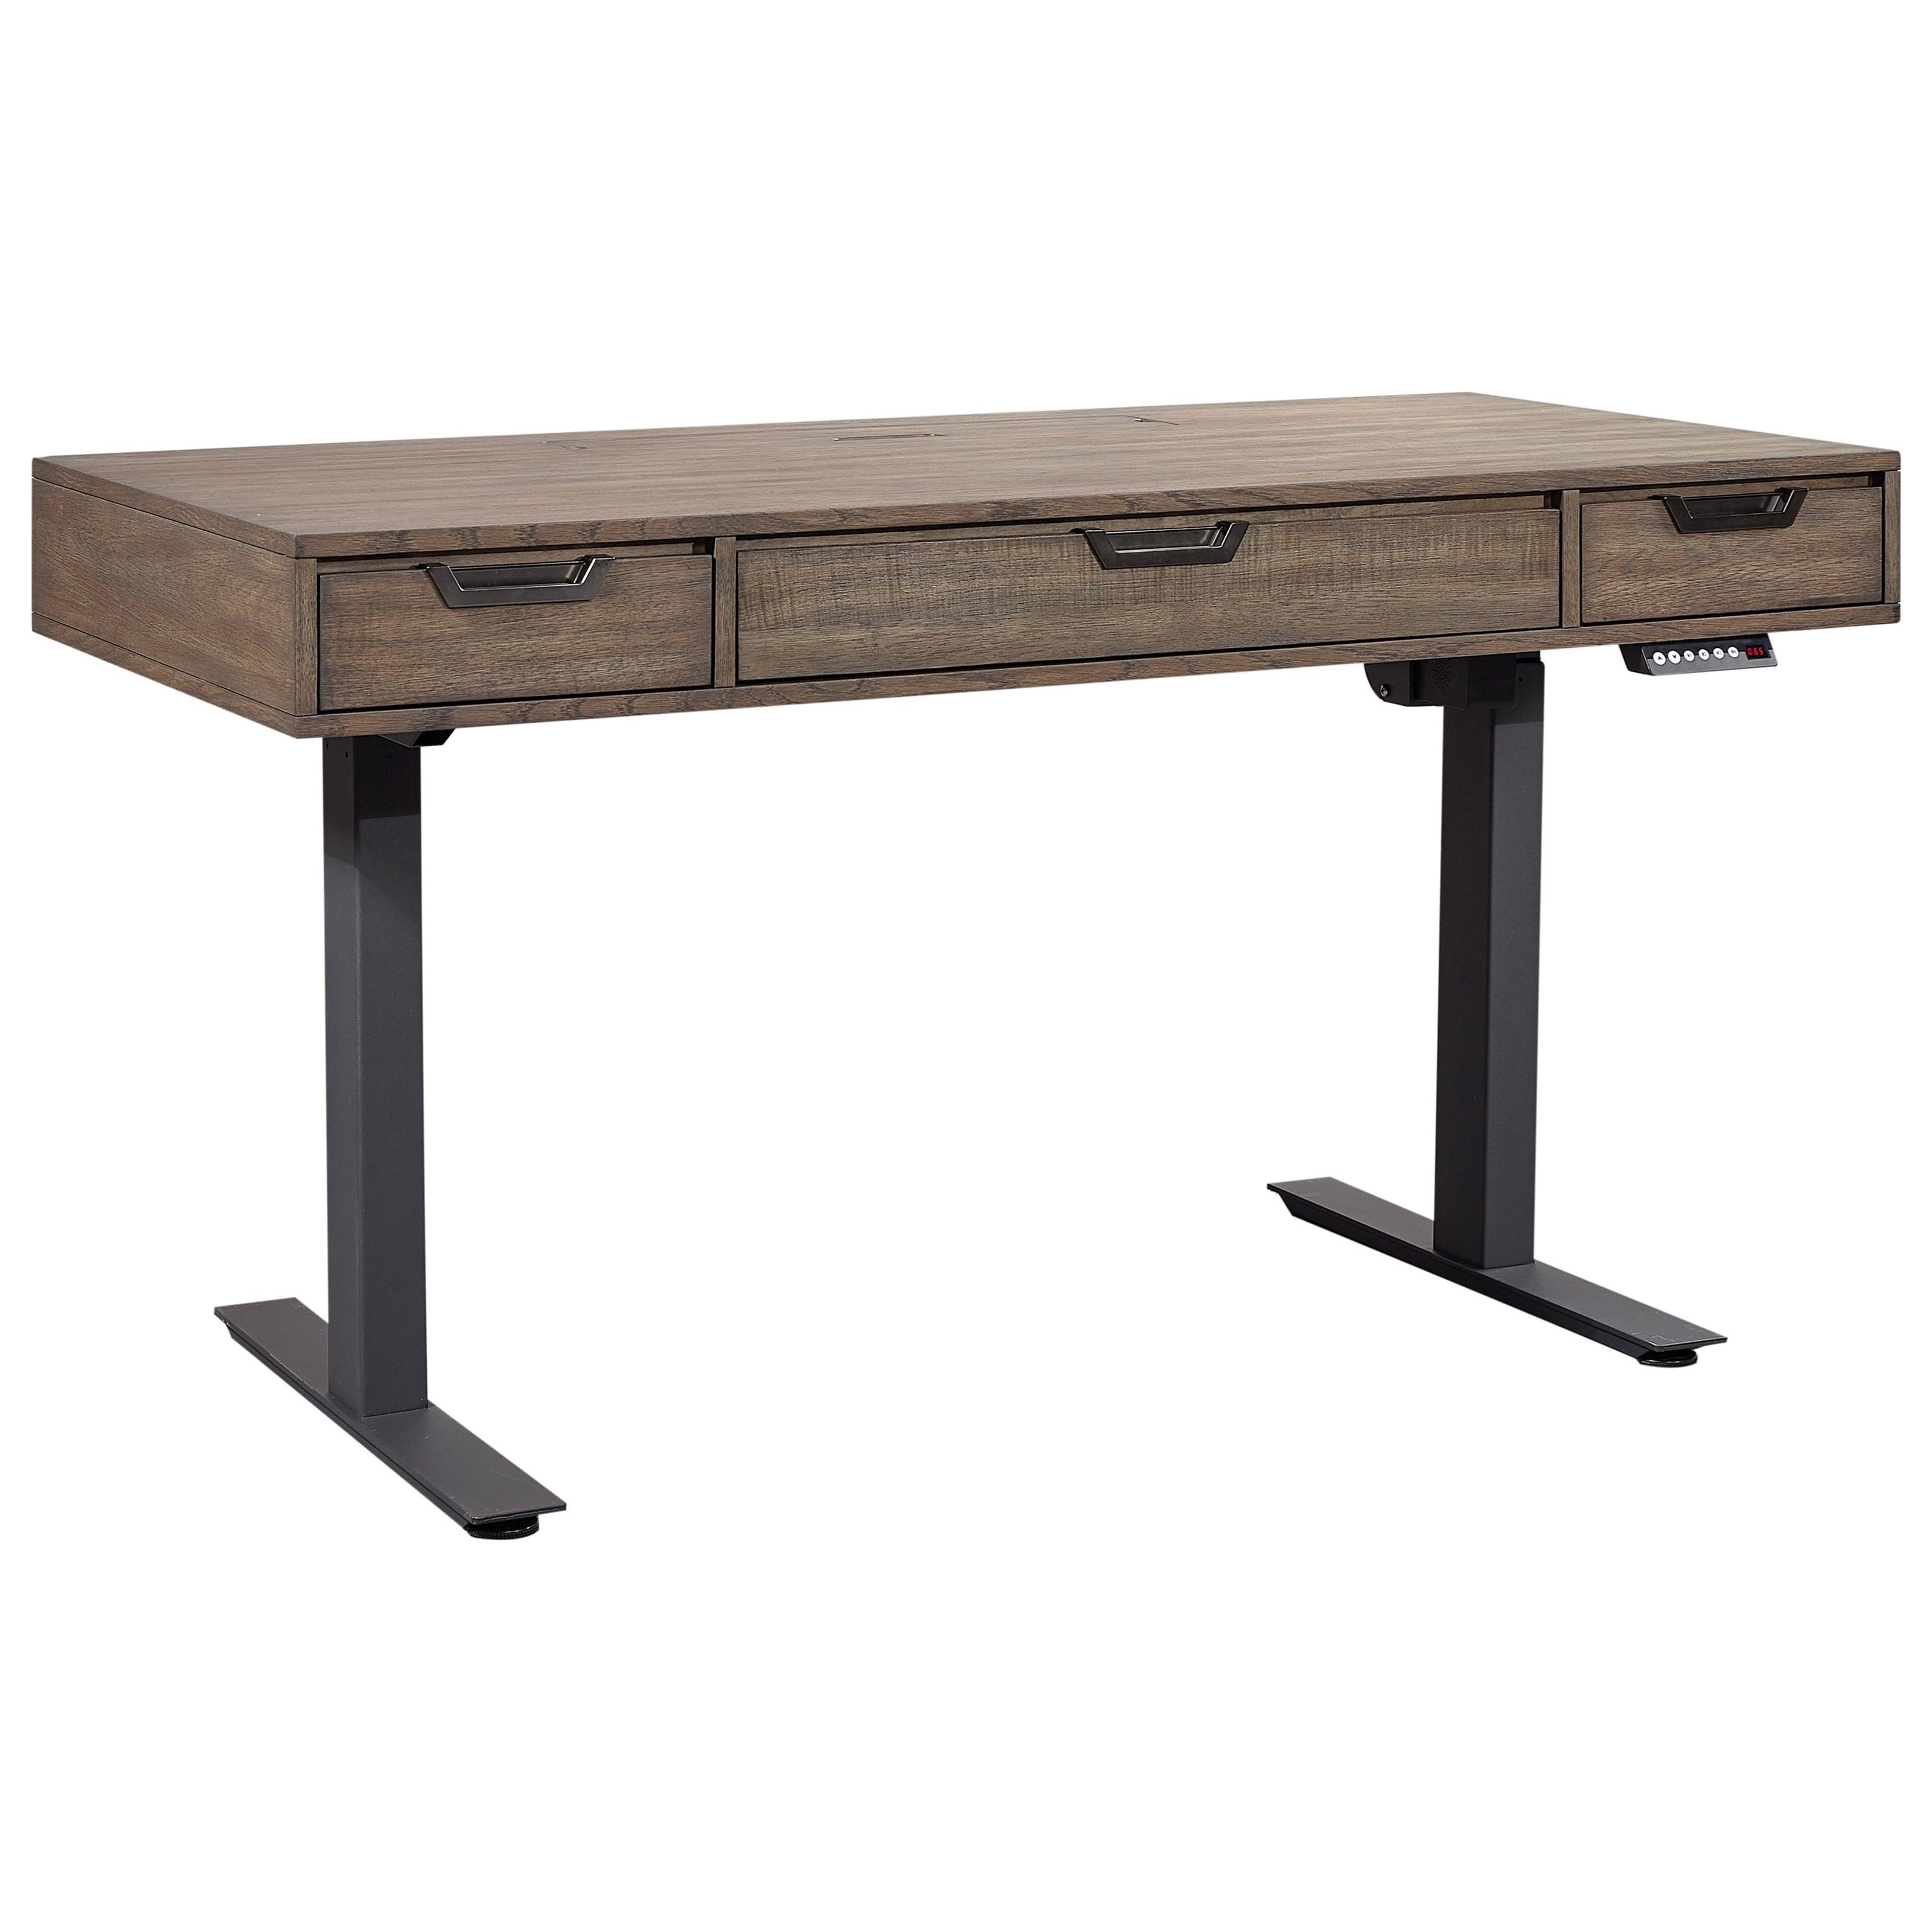 Aspenhome Harper Point Contemporary Adjustable Lift Desk